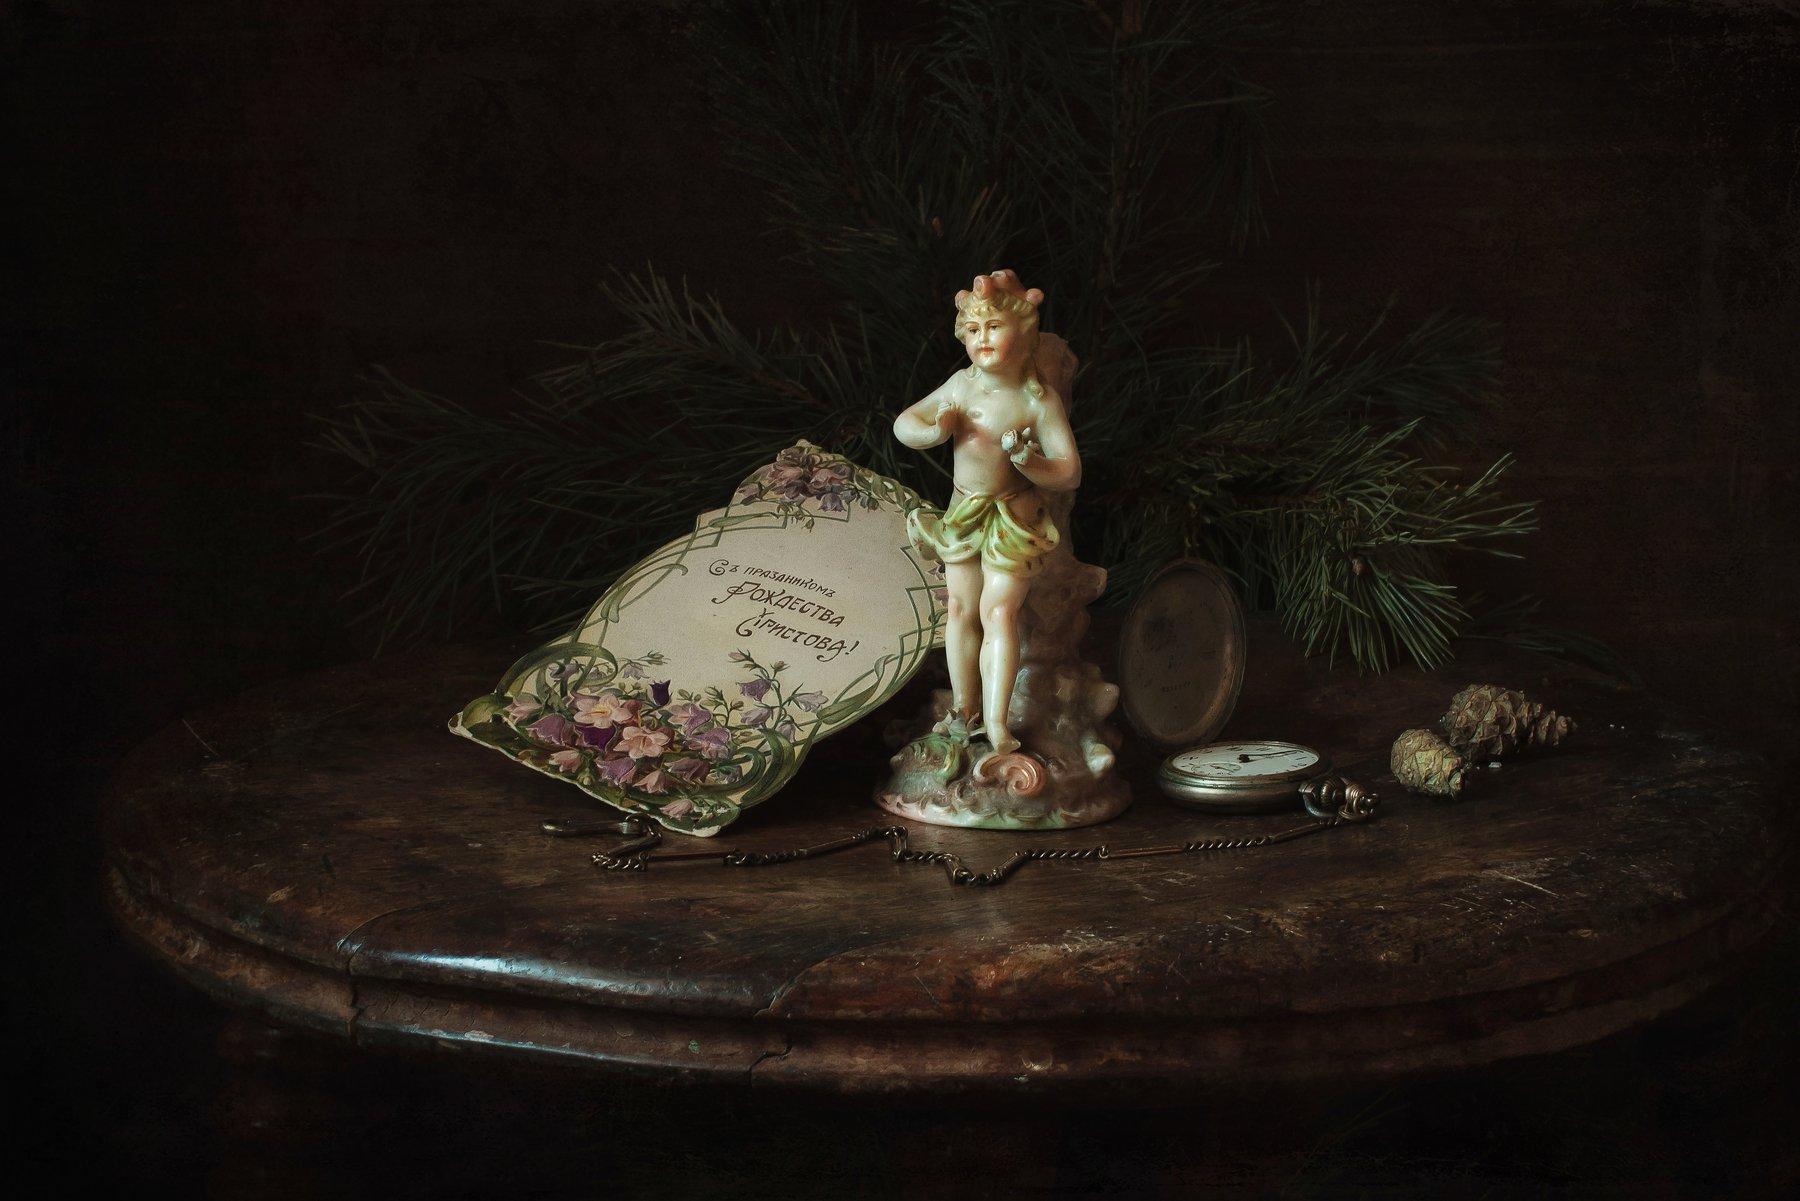 натюрморт, рождество, ёлка, фарфор, статуэтка, открытка, часы, Анна Петина